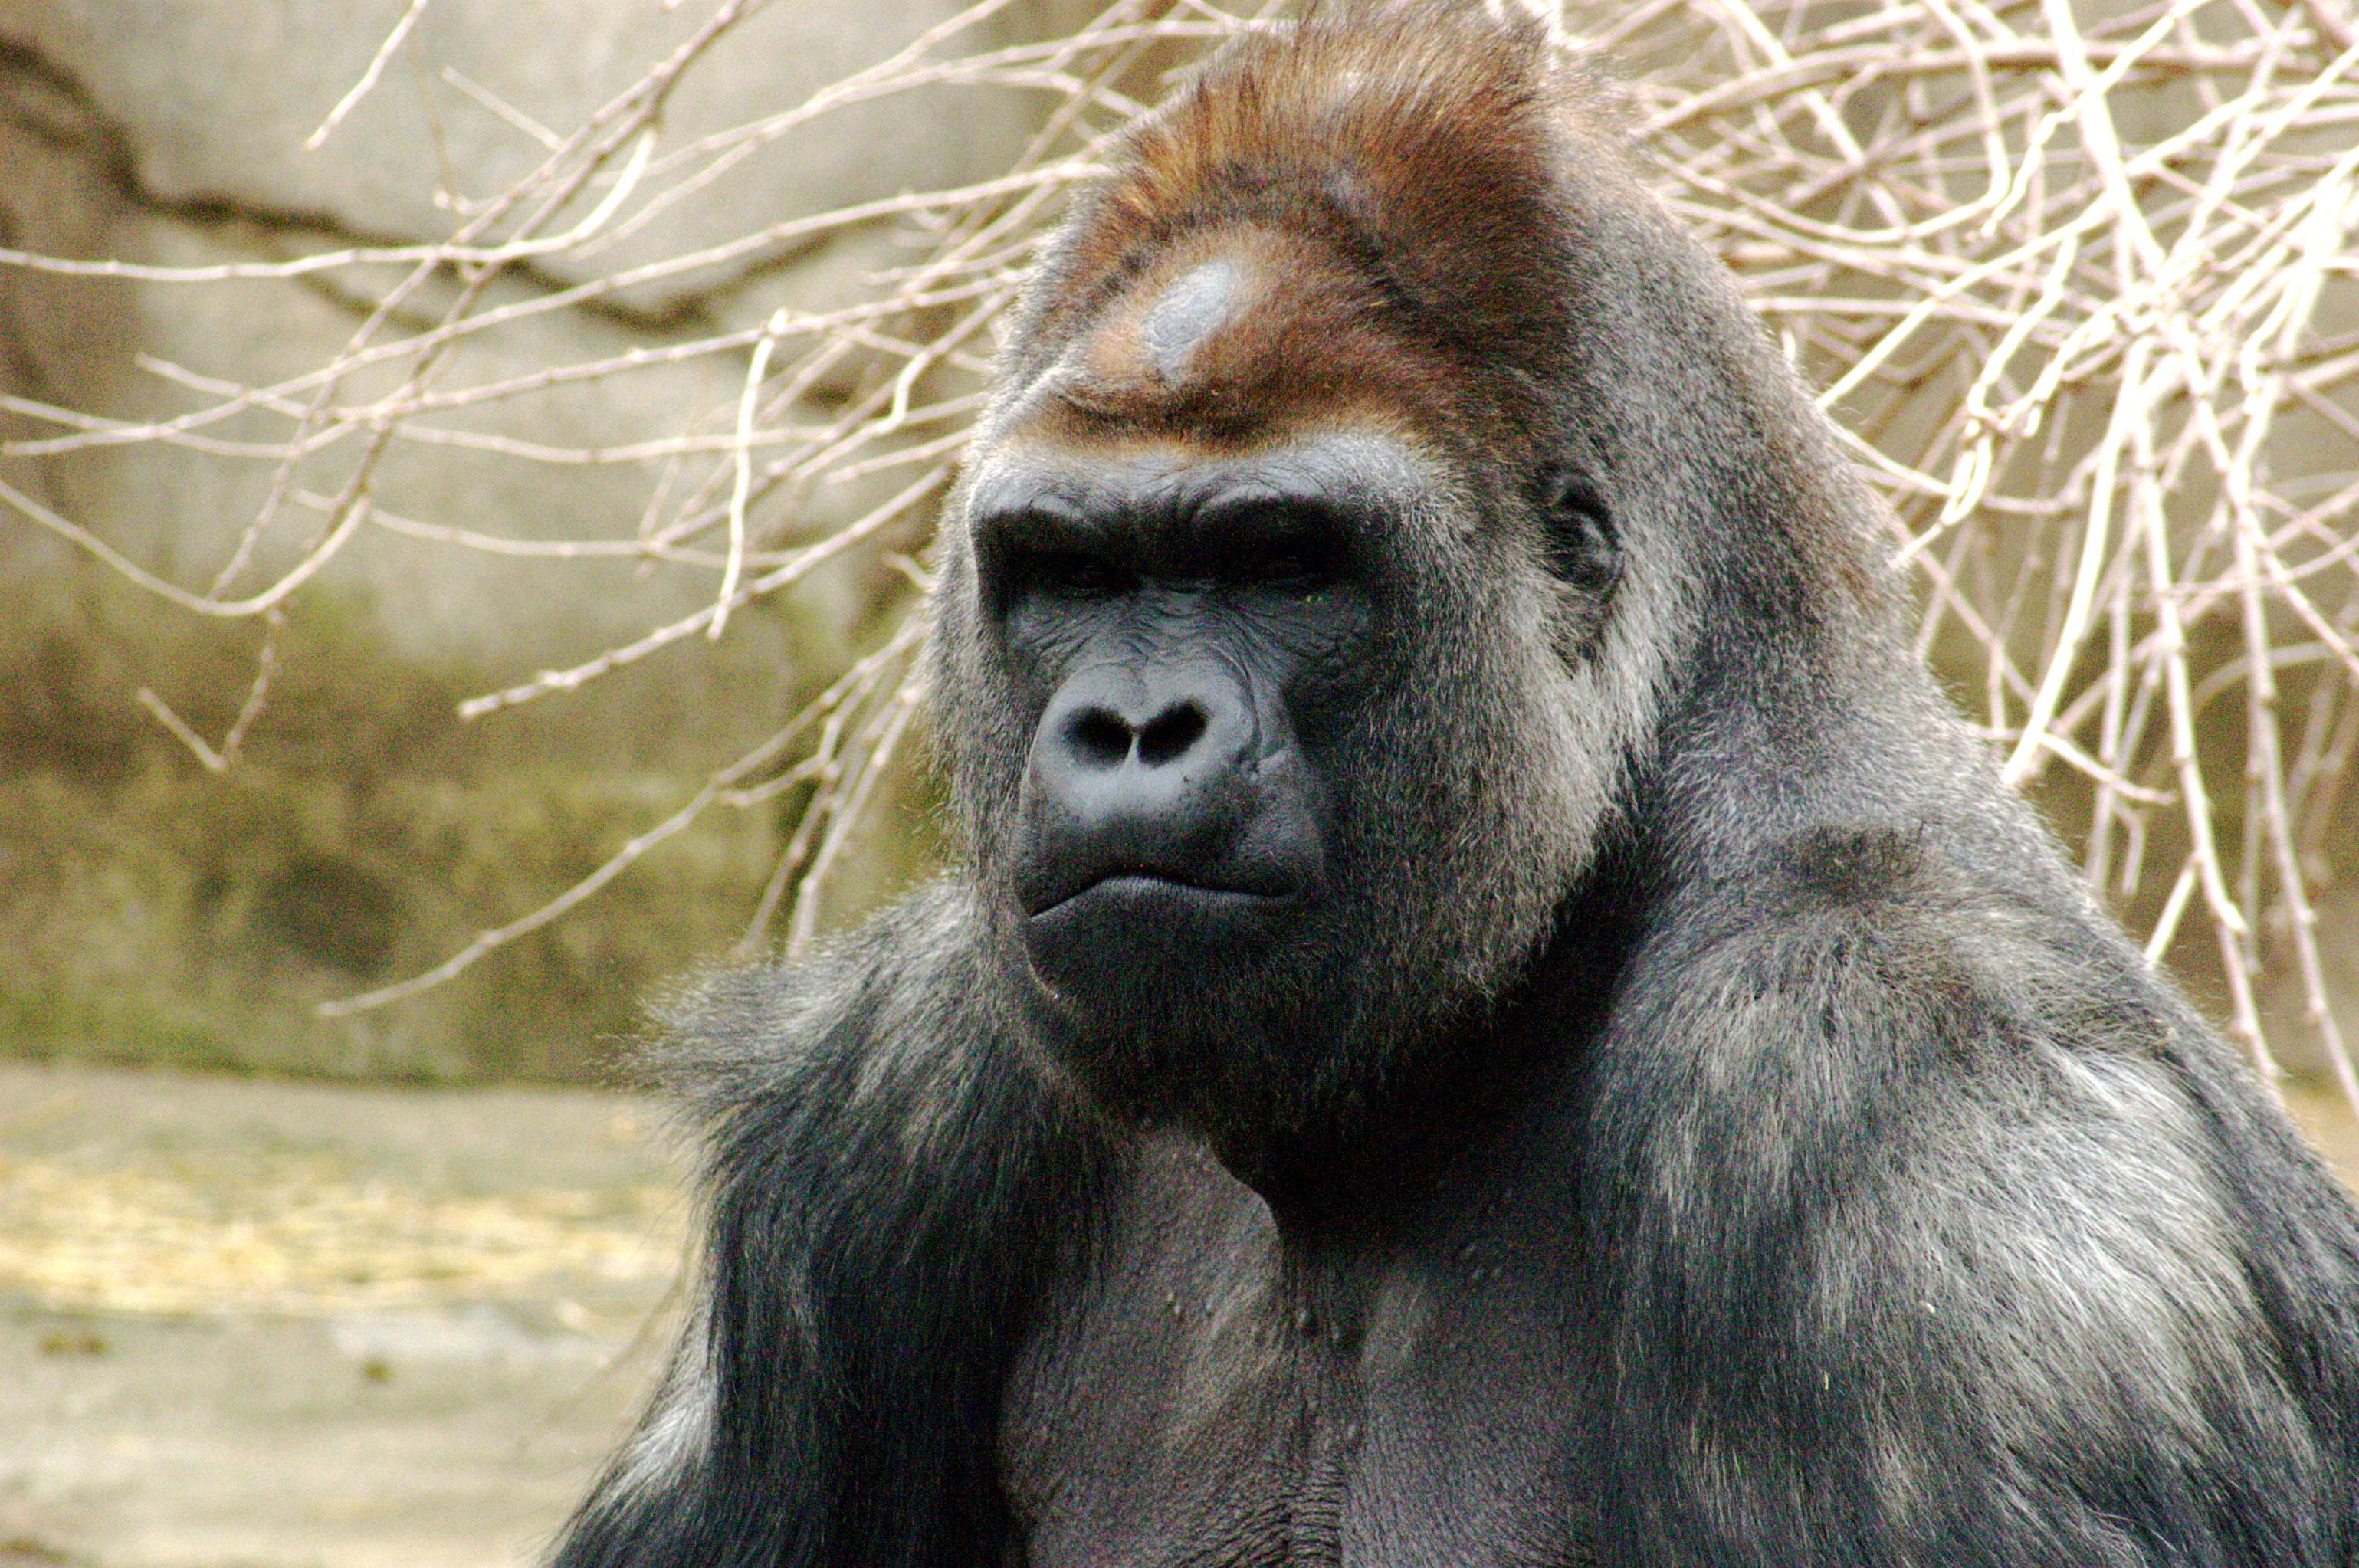 http://cdn.oboi7.com/99f9ec9d59f44736845cecae10267b2ca5515375/zhivotnye-obezyany-gorilly-primaty.jpg